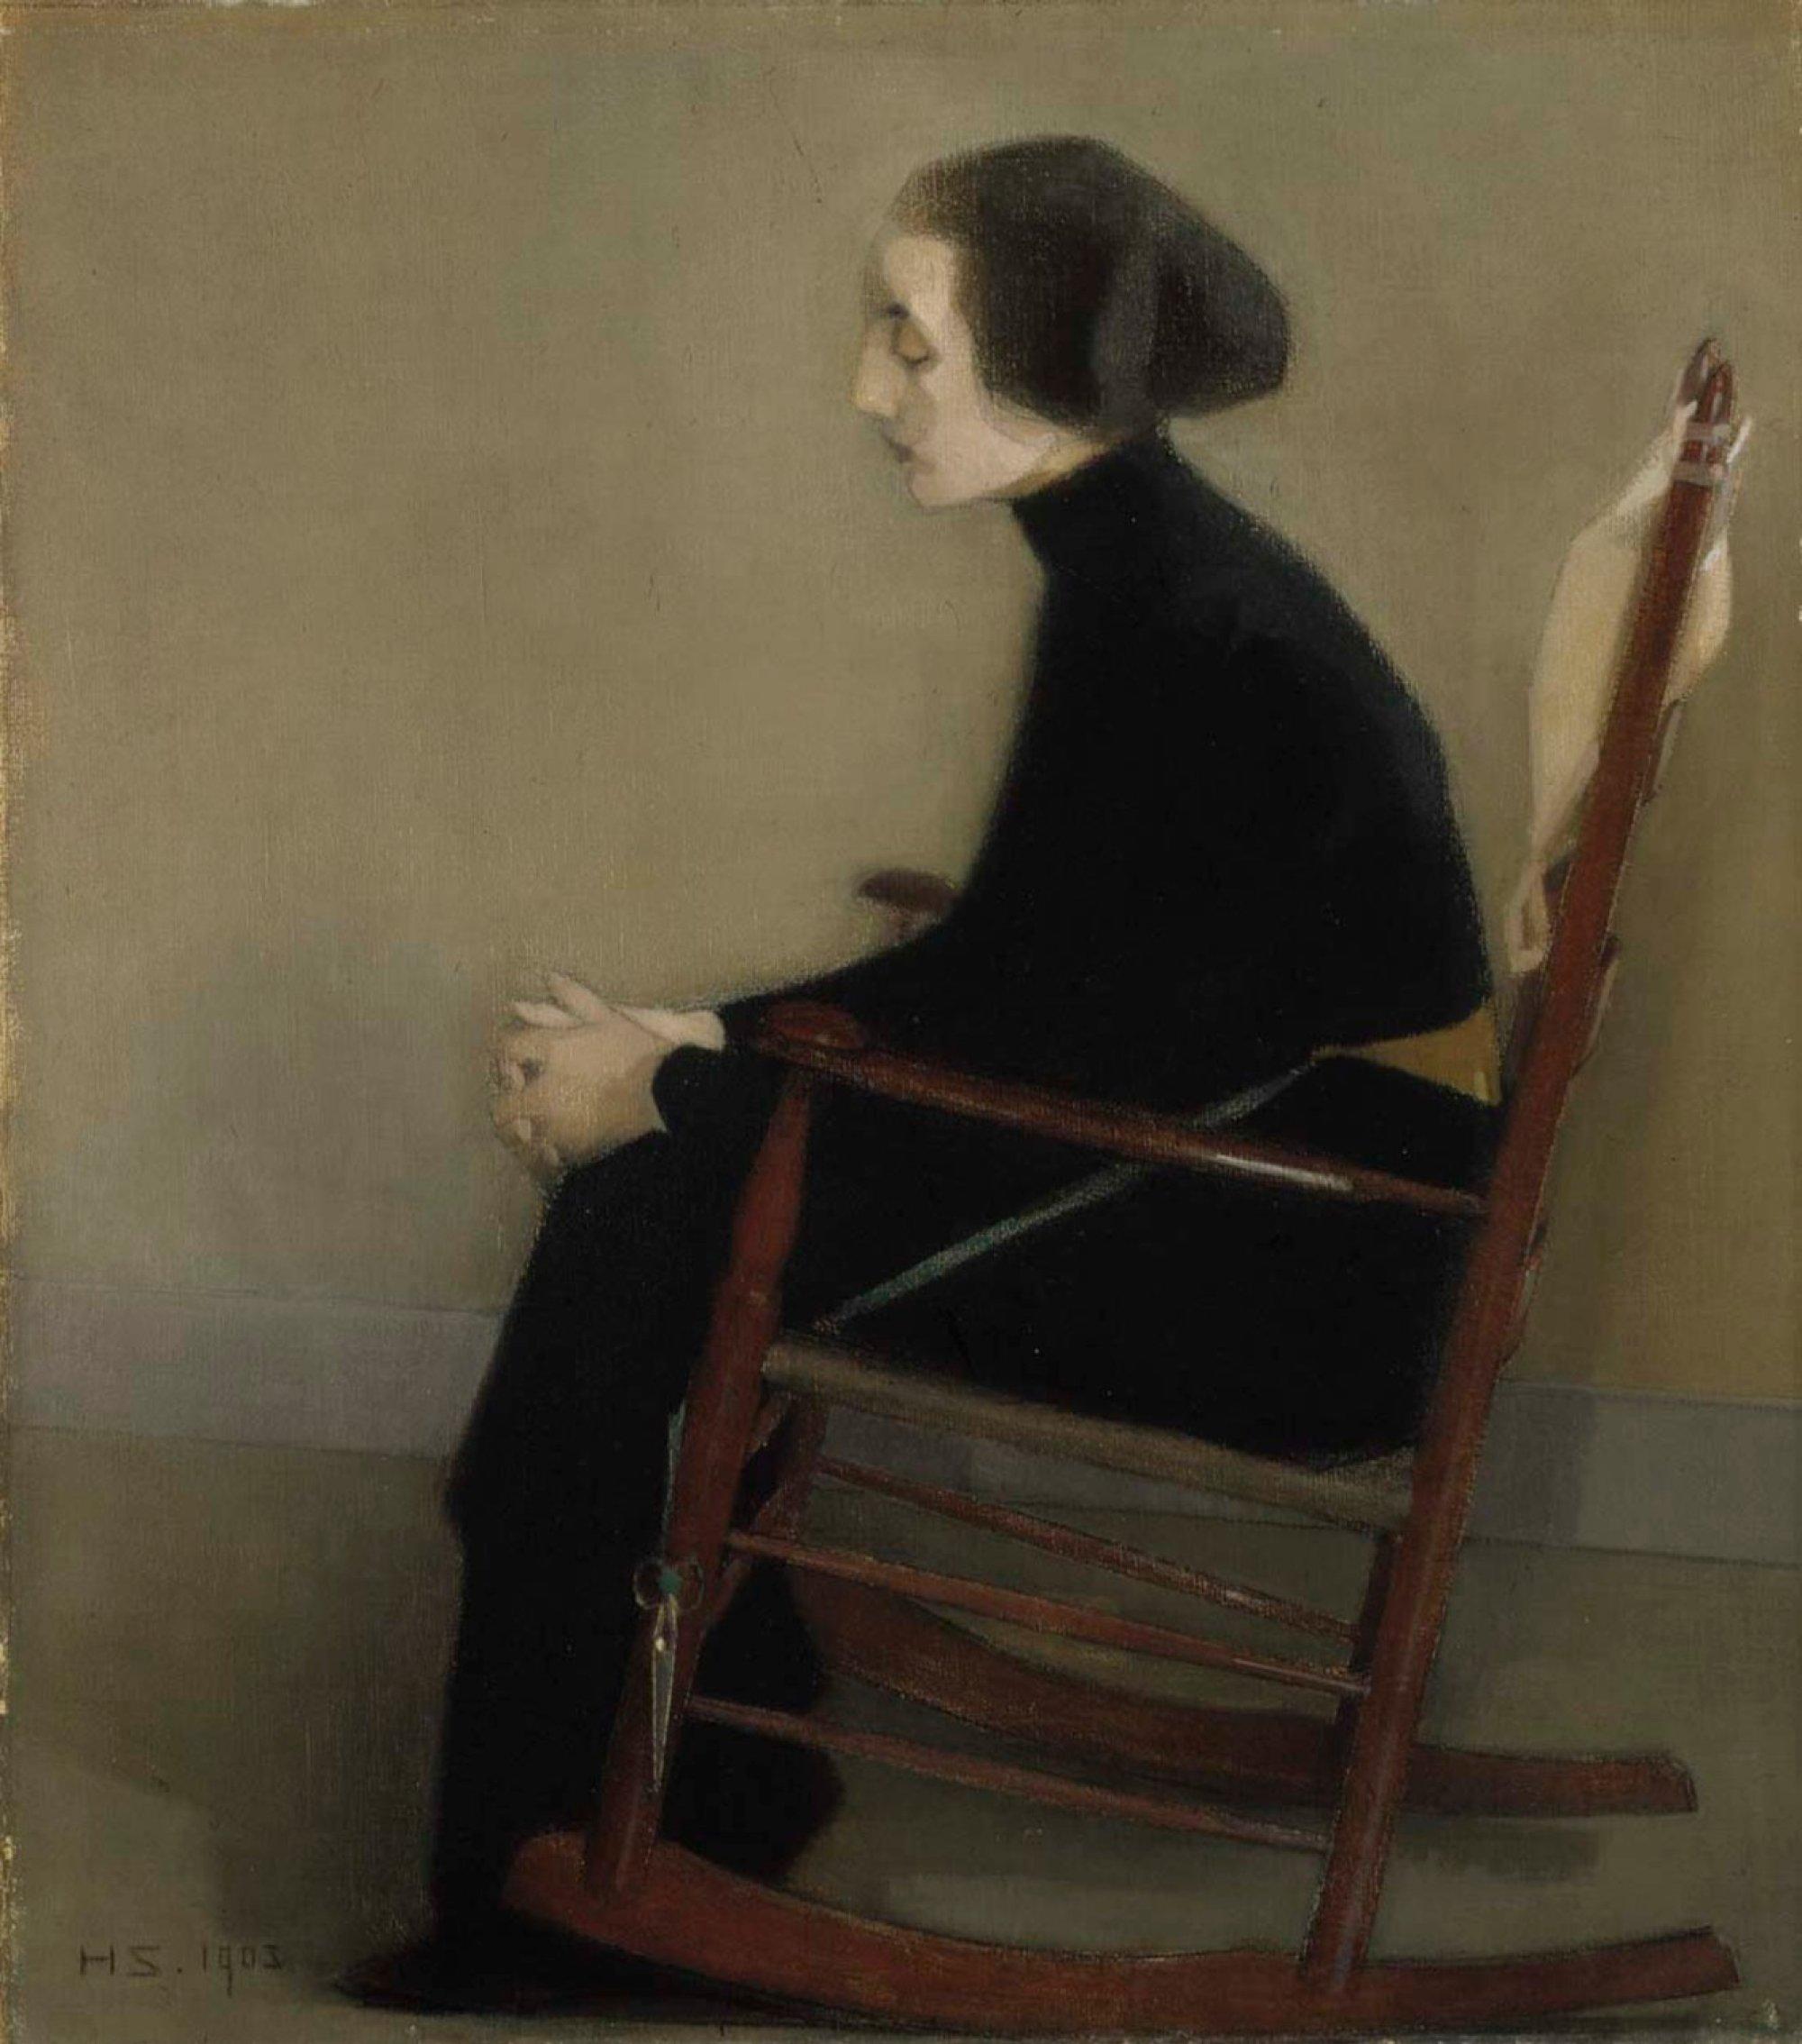 The Seamstress (The Working Woman) från 1905. Bild: Europeana